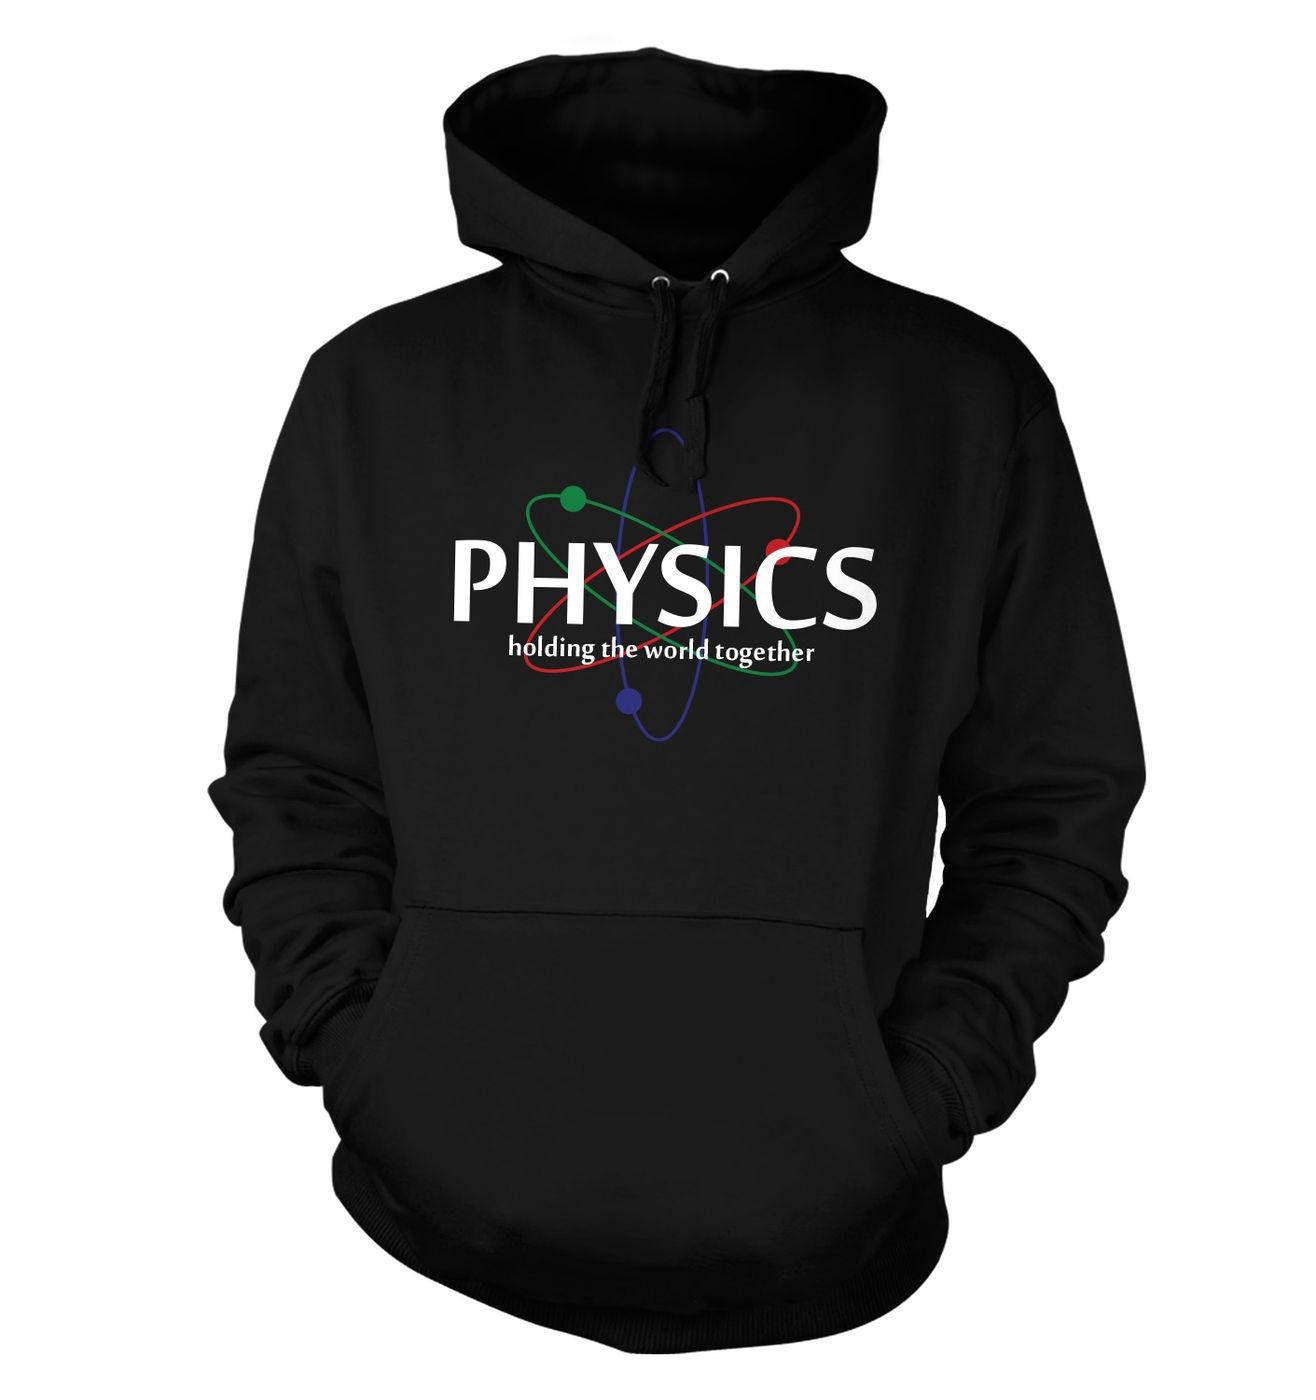 Physics hoodie - stylish science hoody